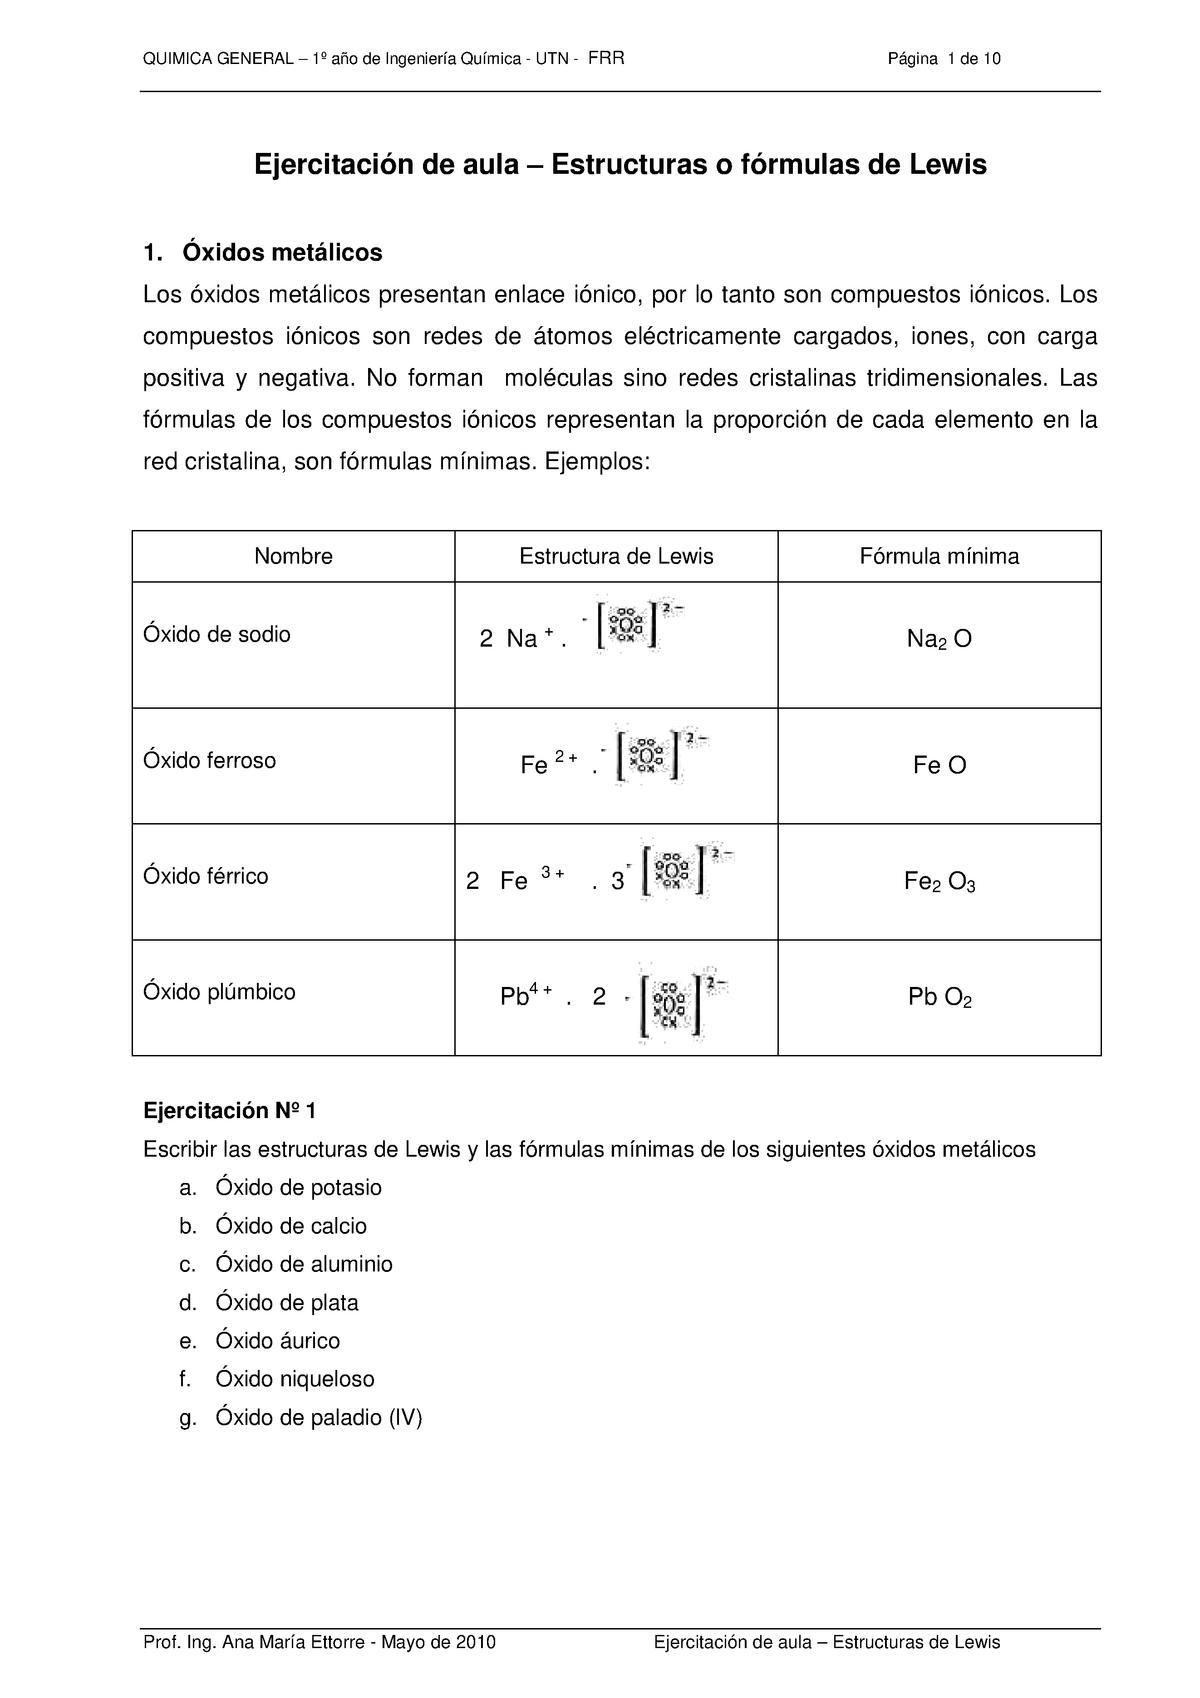 Estructura Lewis Química Unt Studocu